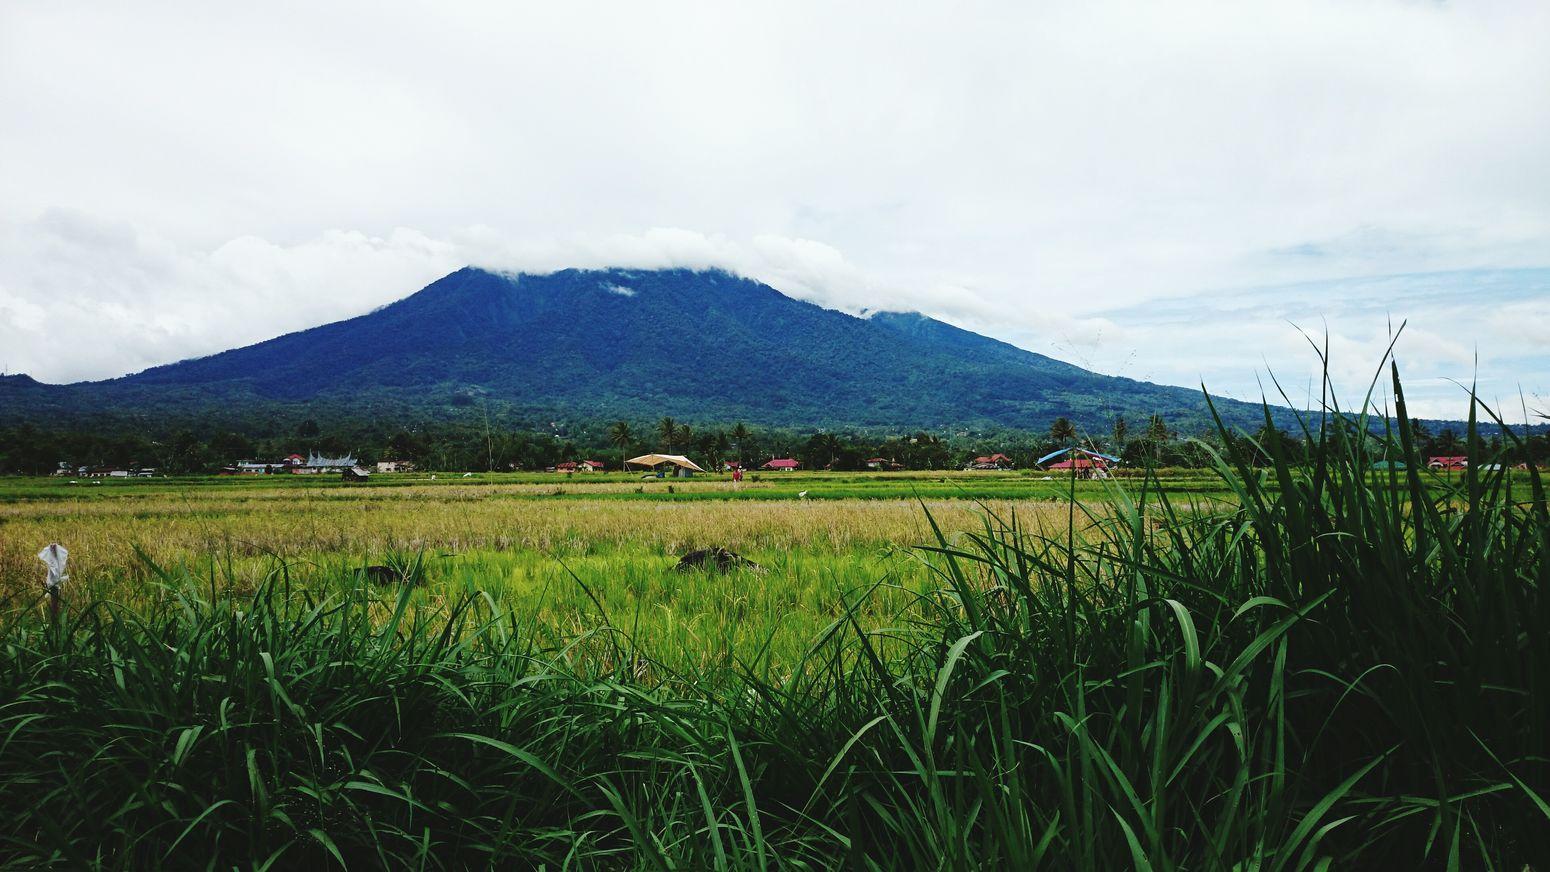 Gunung berapi sumbar Eye Em Nature Lover The Week On Eyem Streetphotography Nature_collection